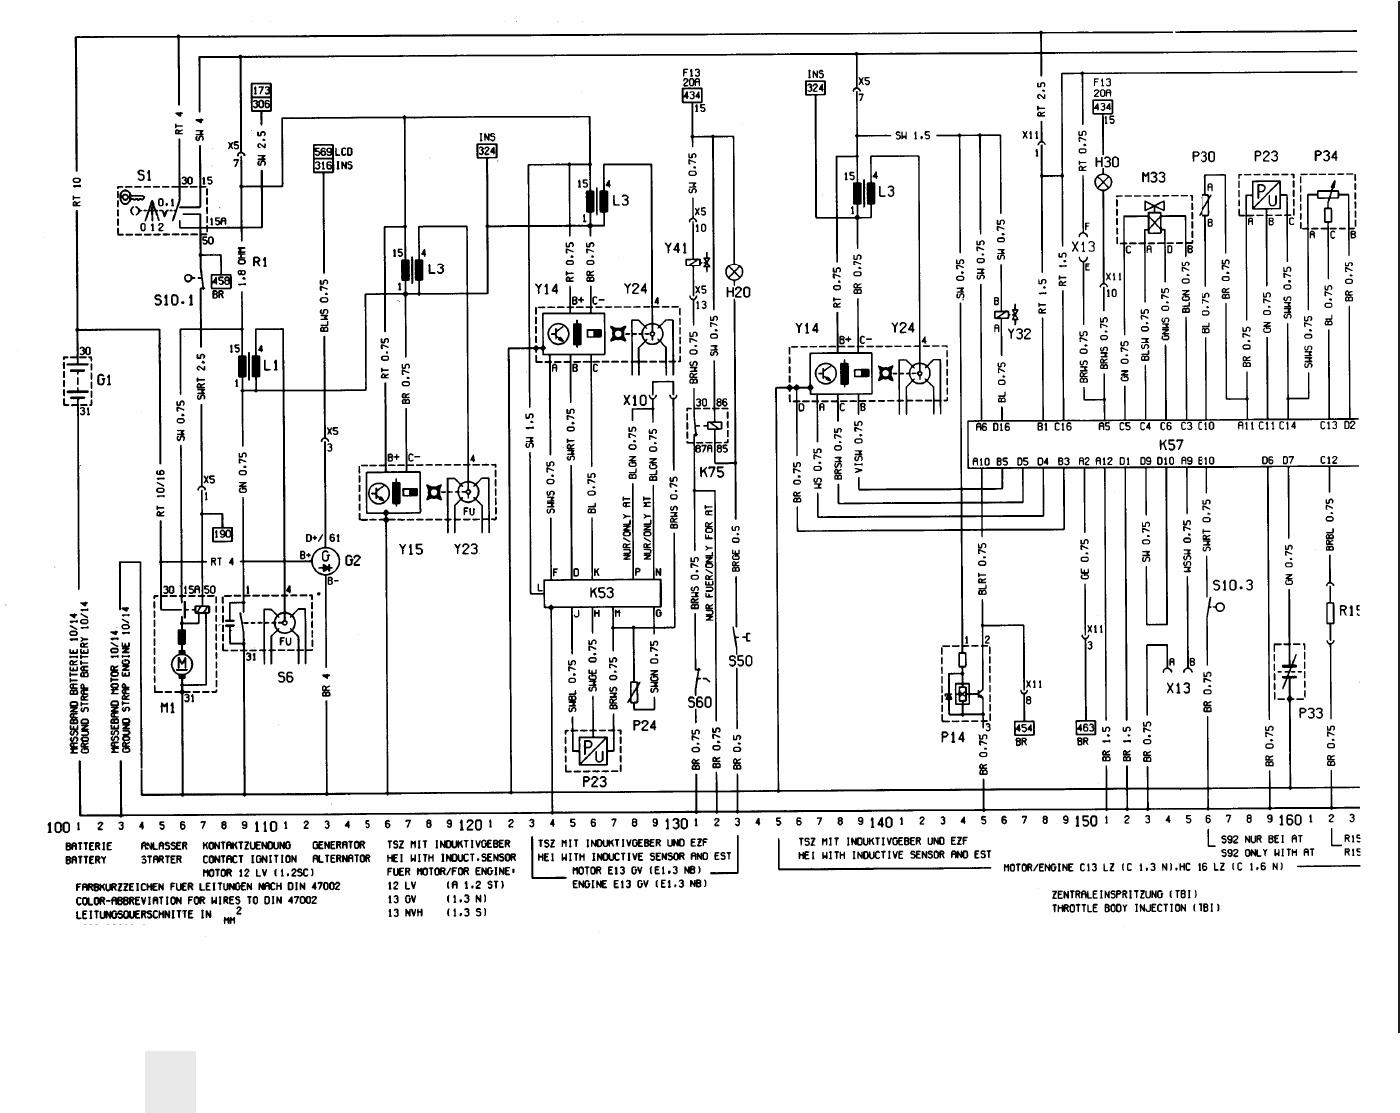 opel meriva 2004 wiring diagram bc 3779  astra h stereo wiring diagram free diagram  bc 3779  astra h stereo wiring diagram